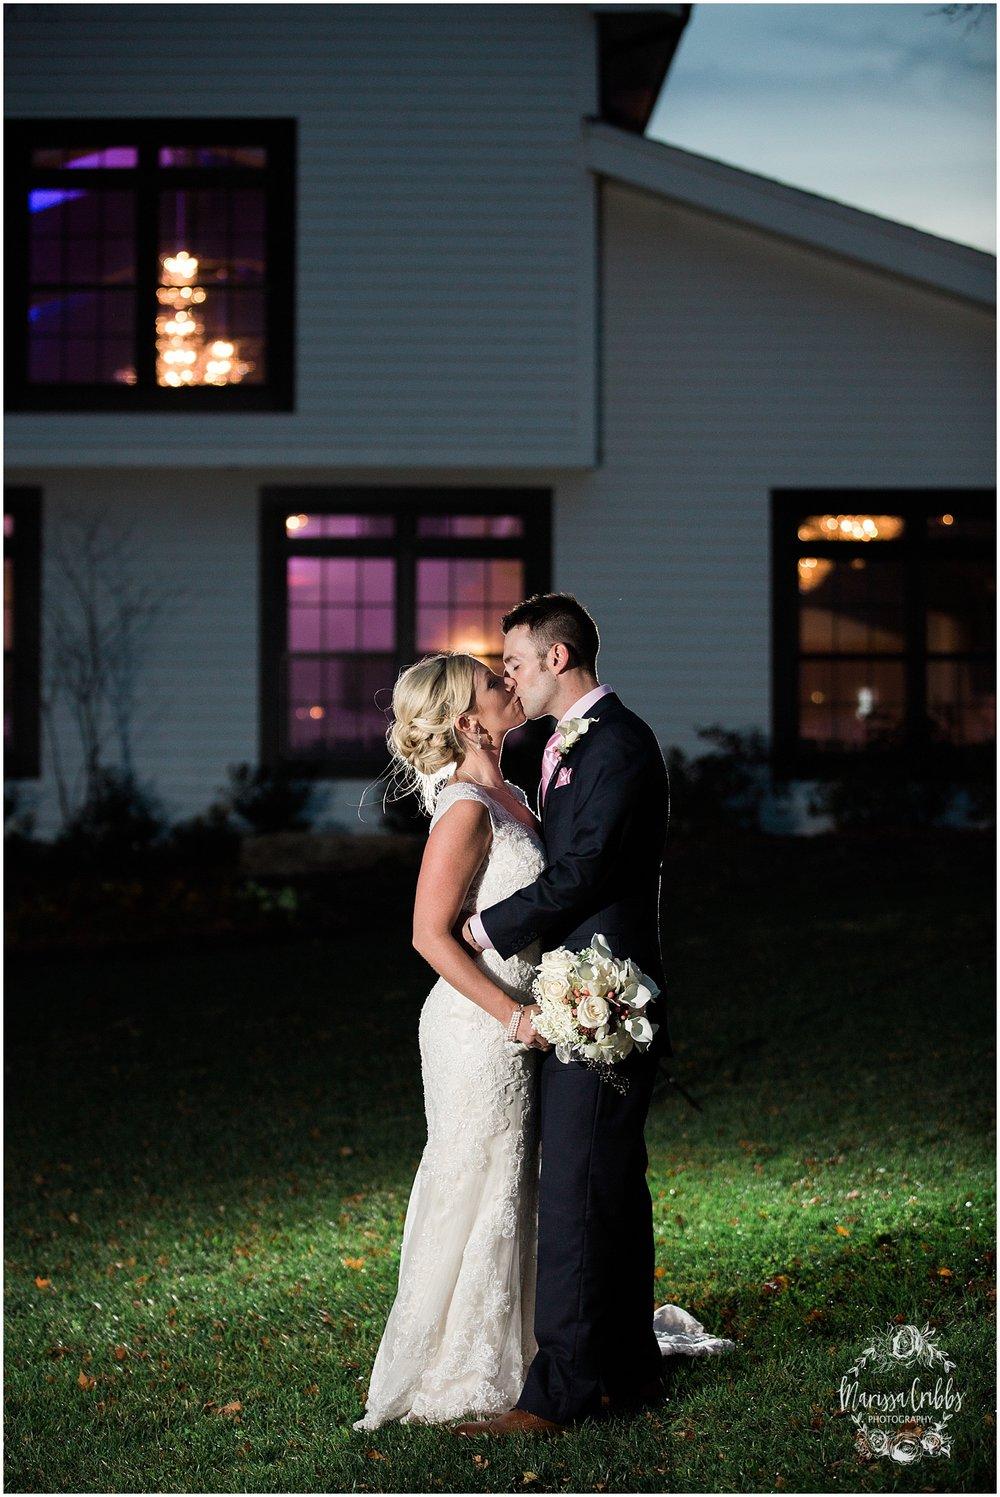 Alex & Amie | Eighteen Ninety Event Space | Marissa Cribbs Photography | Kansas City Perfect Wedding Guide_1364.jpg